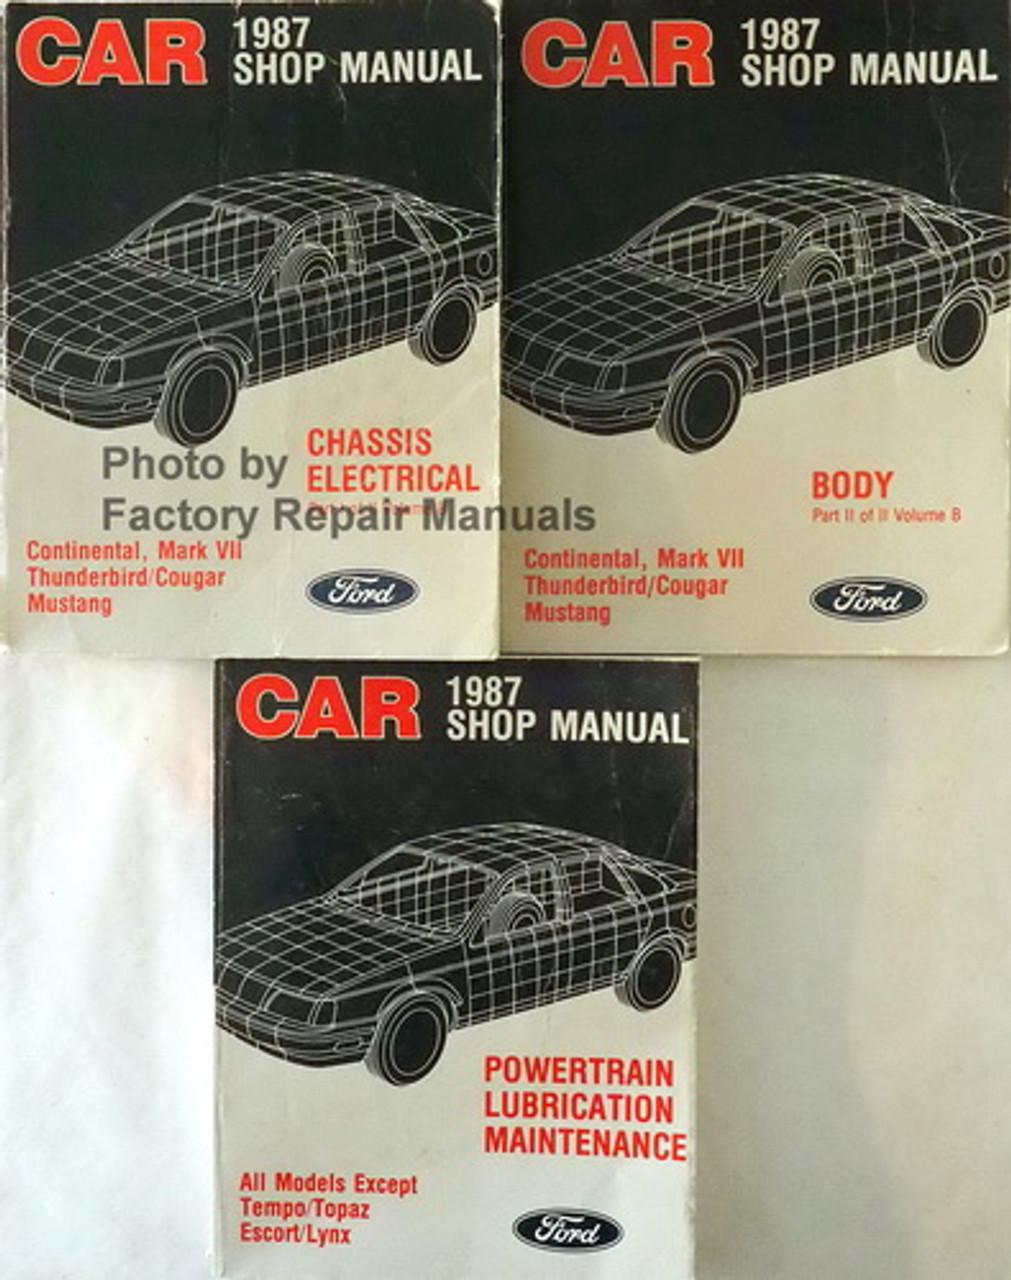 1984 FORD MUSTANG THUNDERBIRD ESCORT LTD MARQUIS ENGINE EMISSIONS SERVICE MANUAL